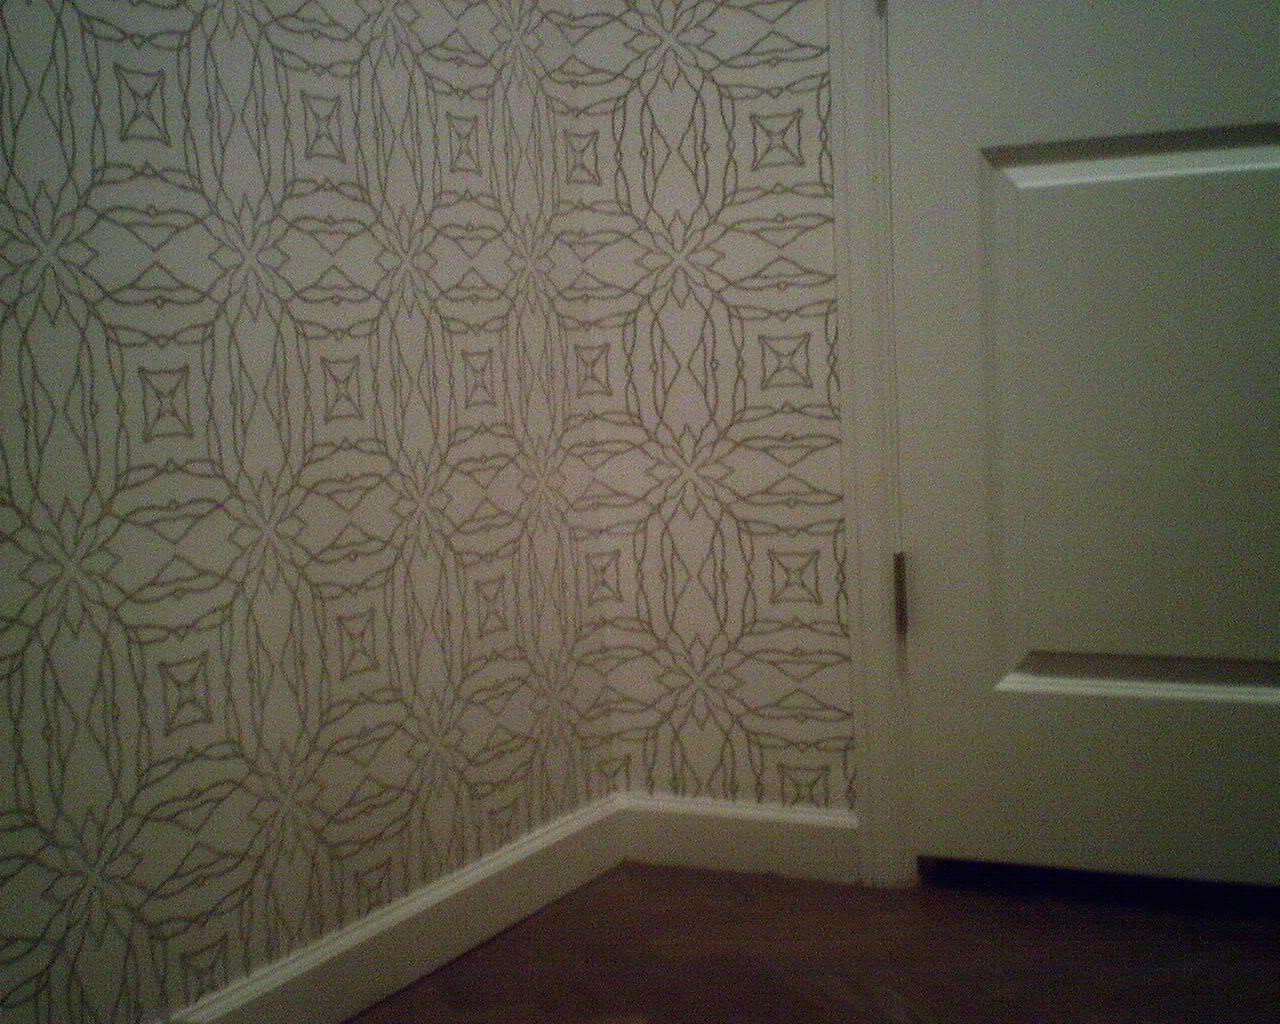 Good Wallpaper Home Screen Pineapple - dsc00053  Snapshot_128716.jpg